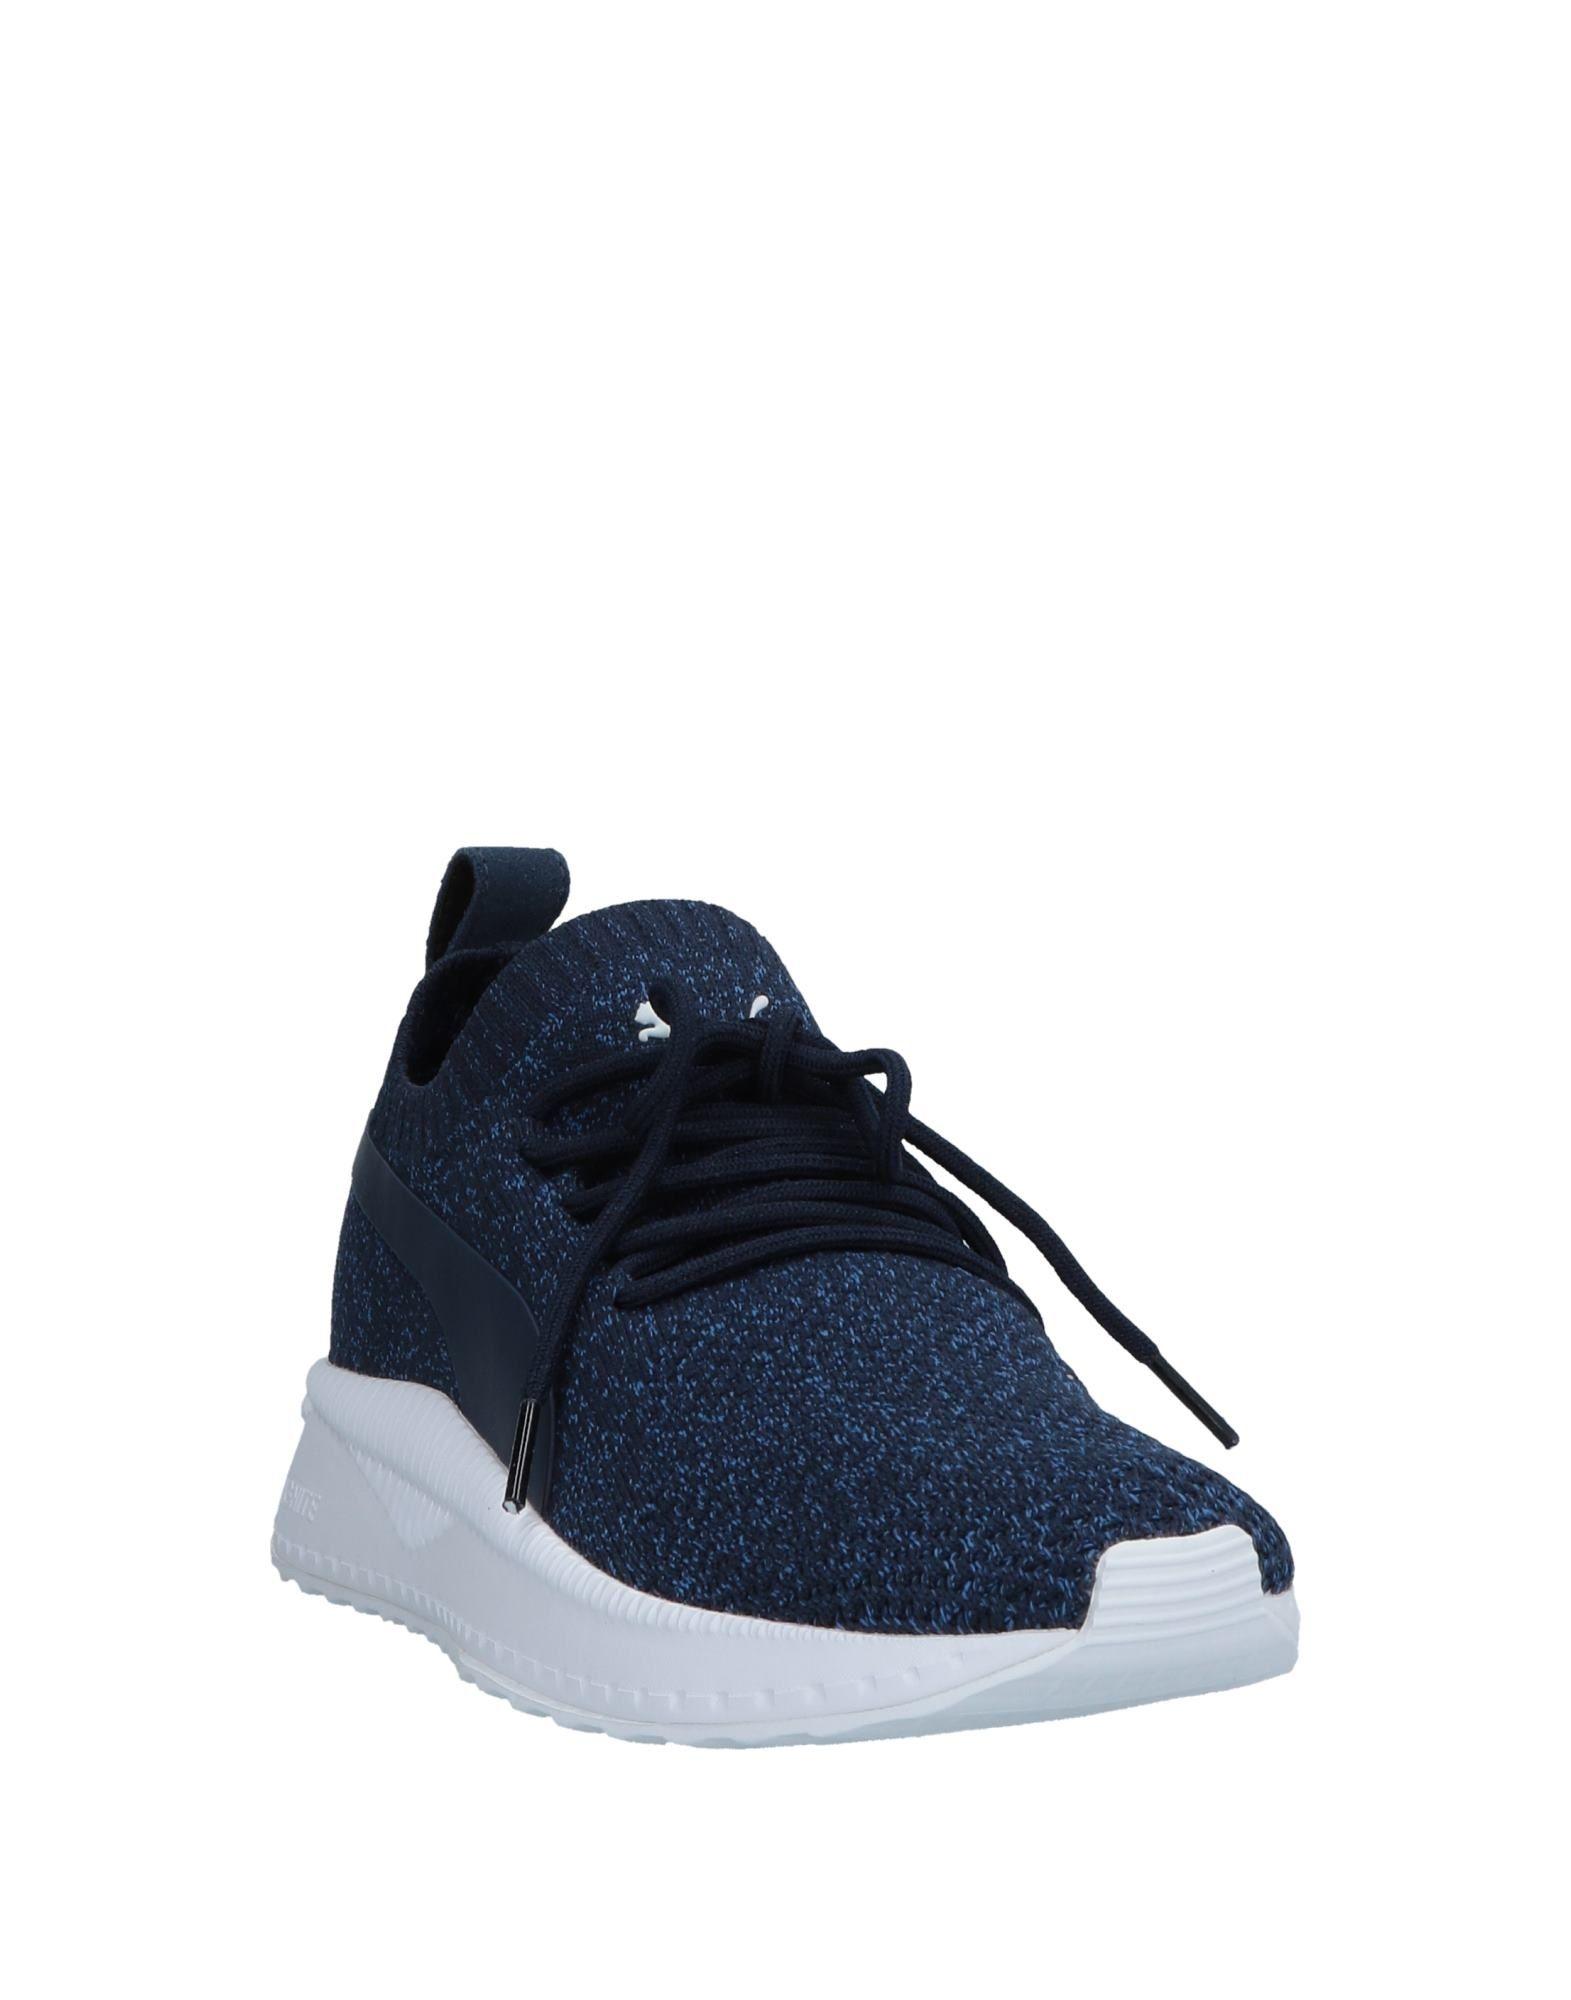 Rabatt echte Schuhe Puma Sneakers 11559327QG Herren  11559327QG Sneakers ecf3a5